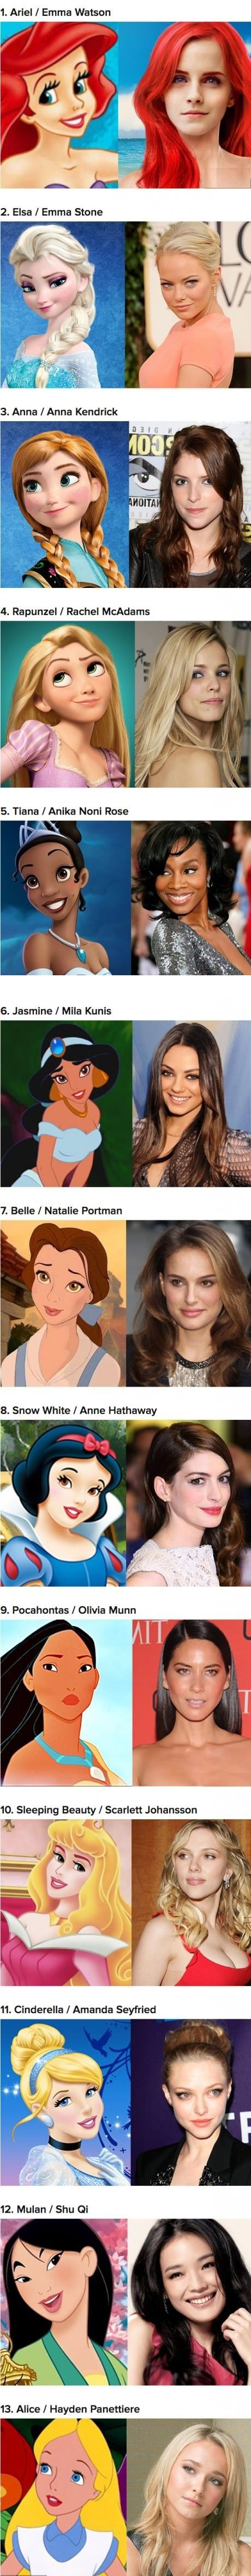 Disney Prinzessinnen  Besetzung